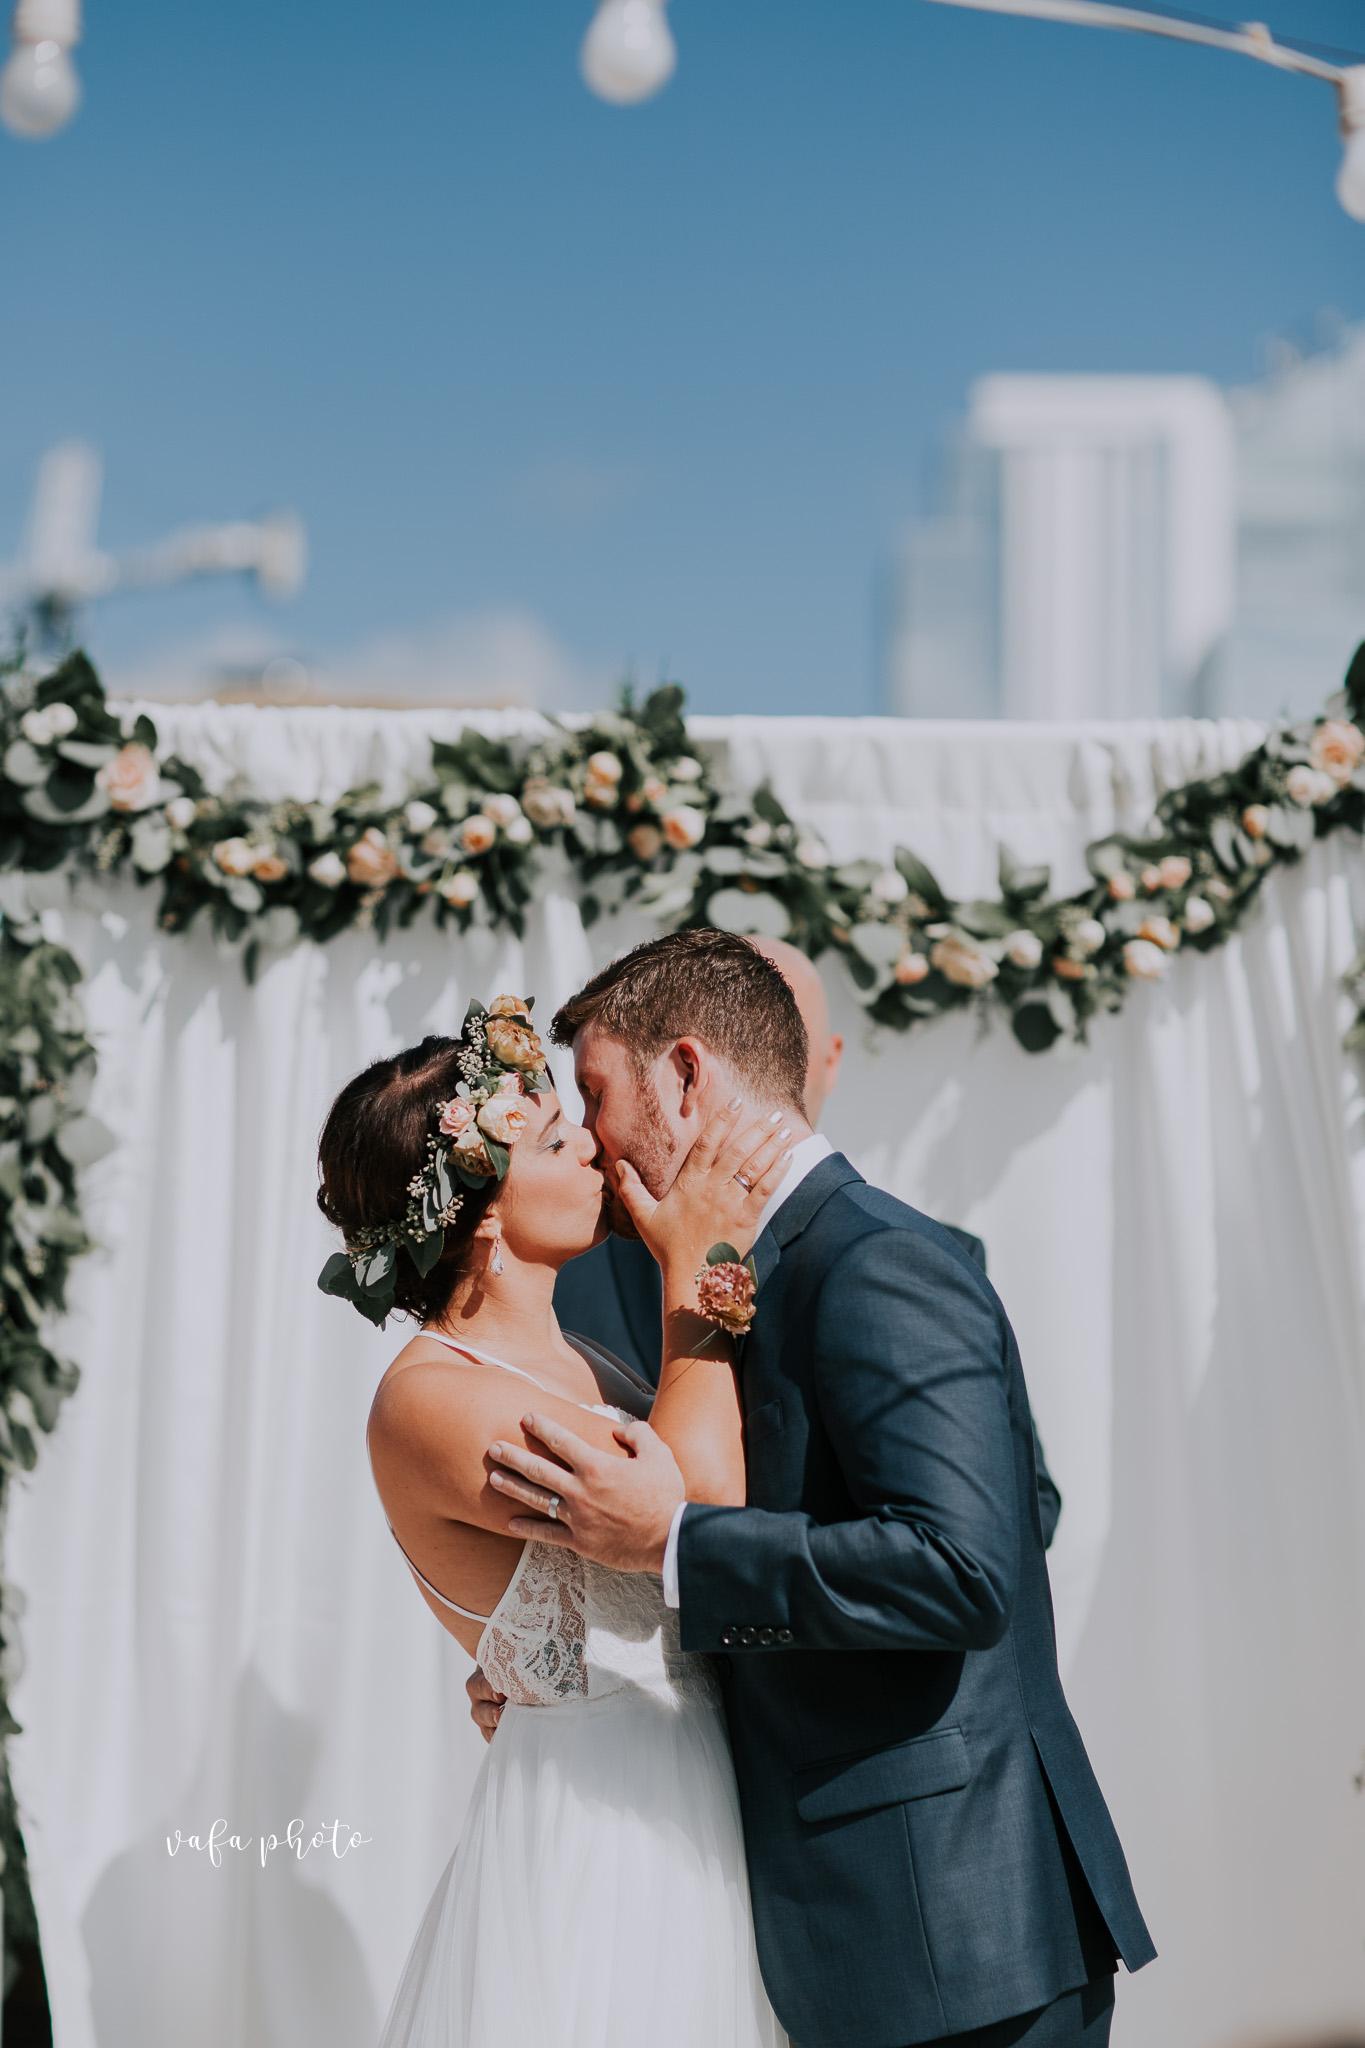 Milwaukee-Athletic-Club-Wedding-Amanda-Tony-Vafa-Photo-390.jpg